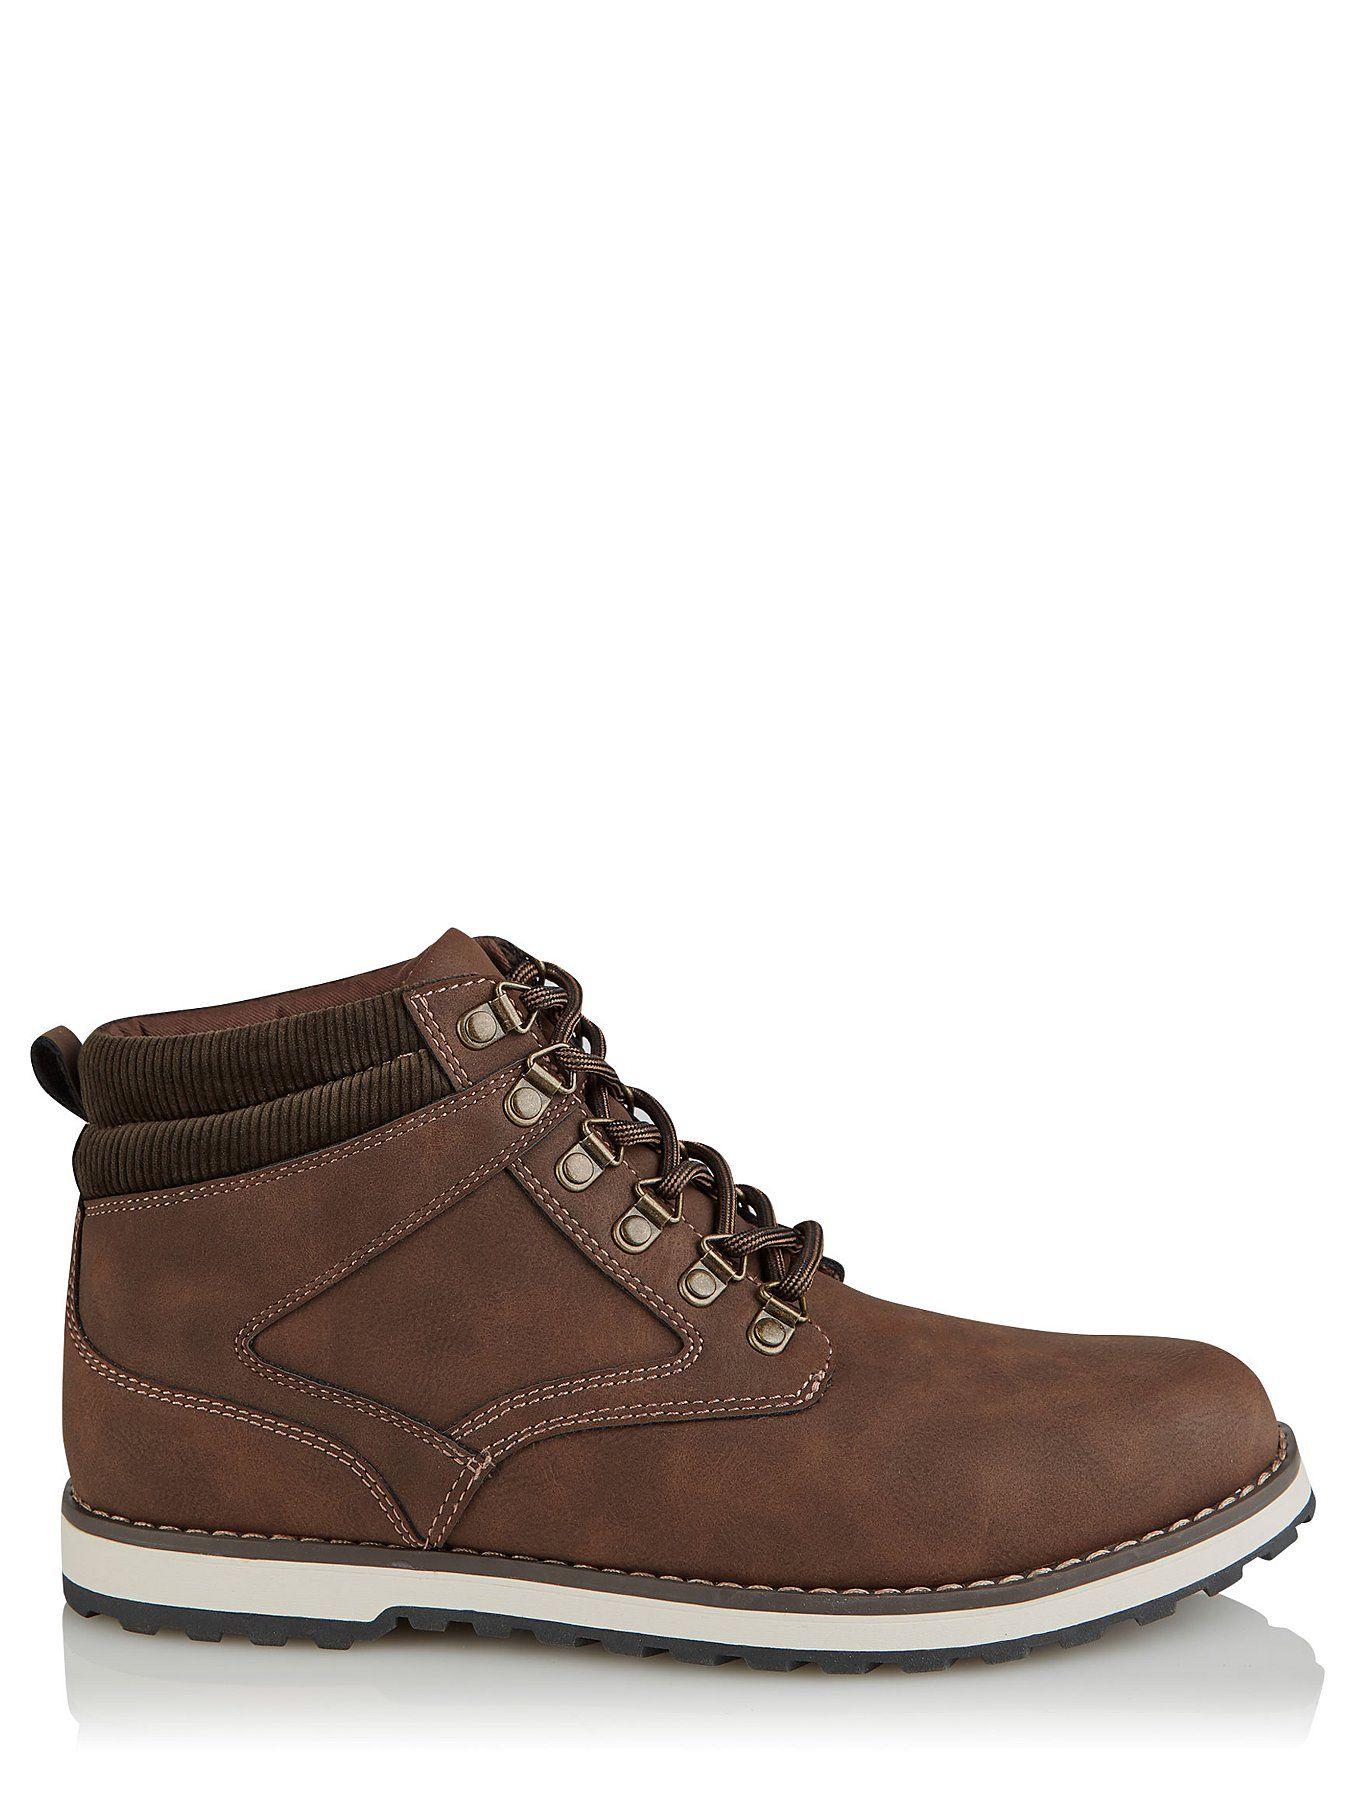 Boots men, Mens trainers